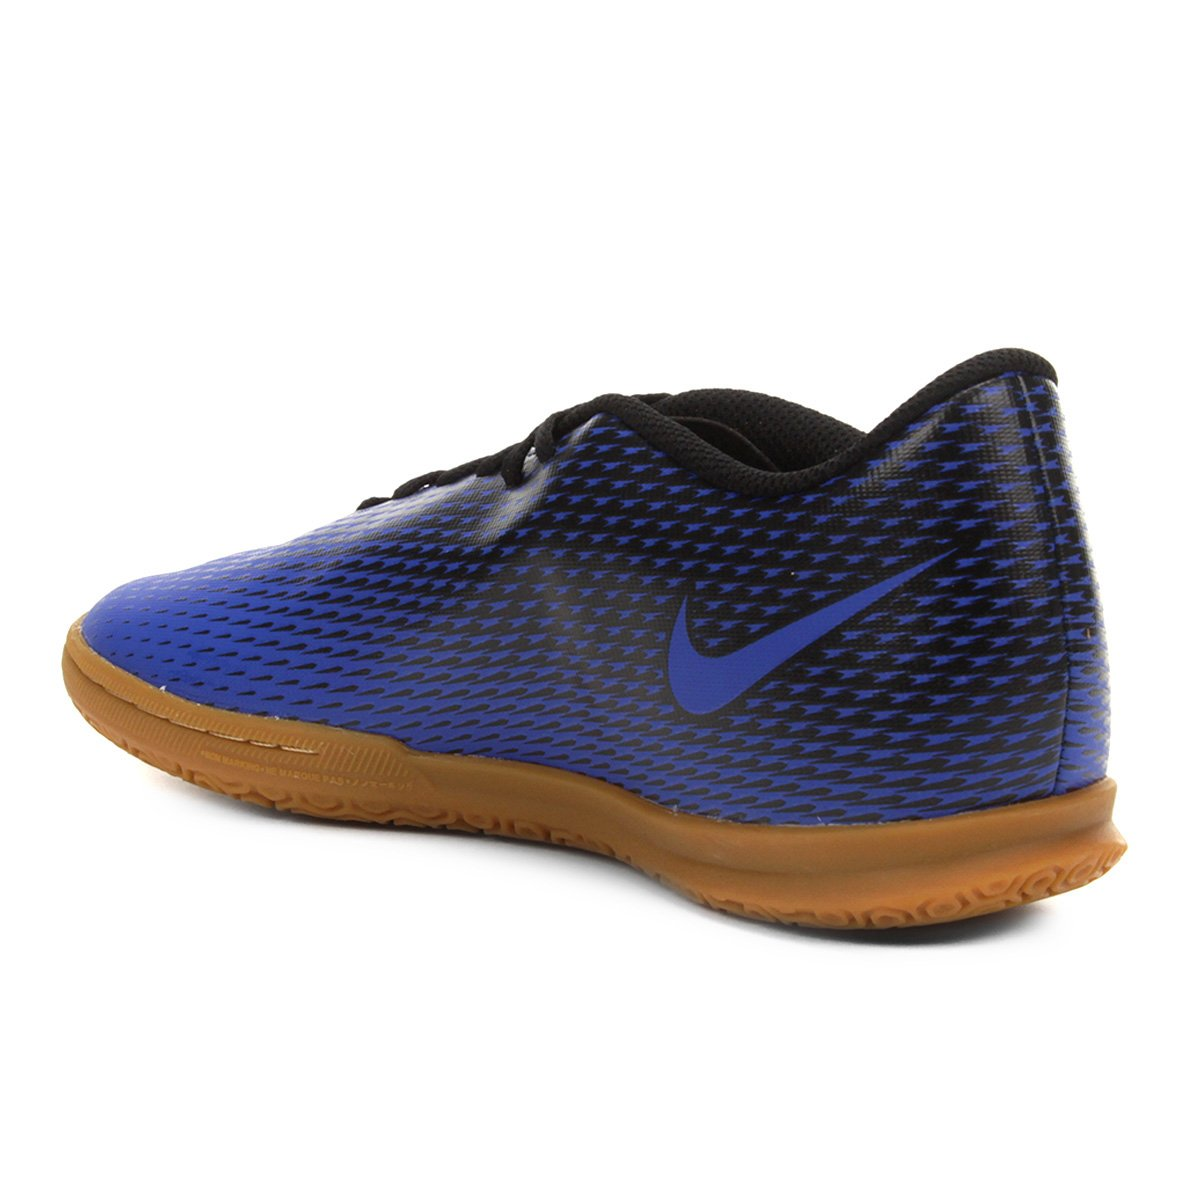 Chuteira Futsal Nike Bravata 2 IC - Azul e Preto - Compre Agora ... 91278e508bbc0